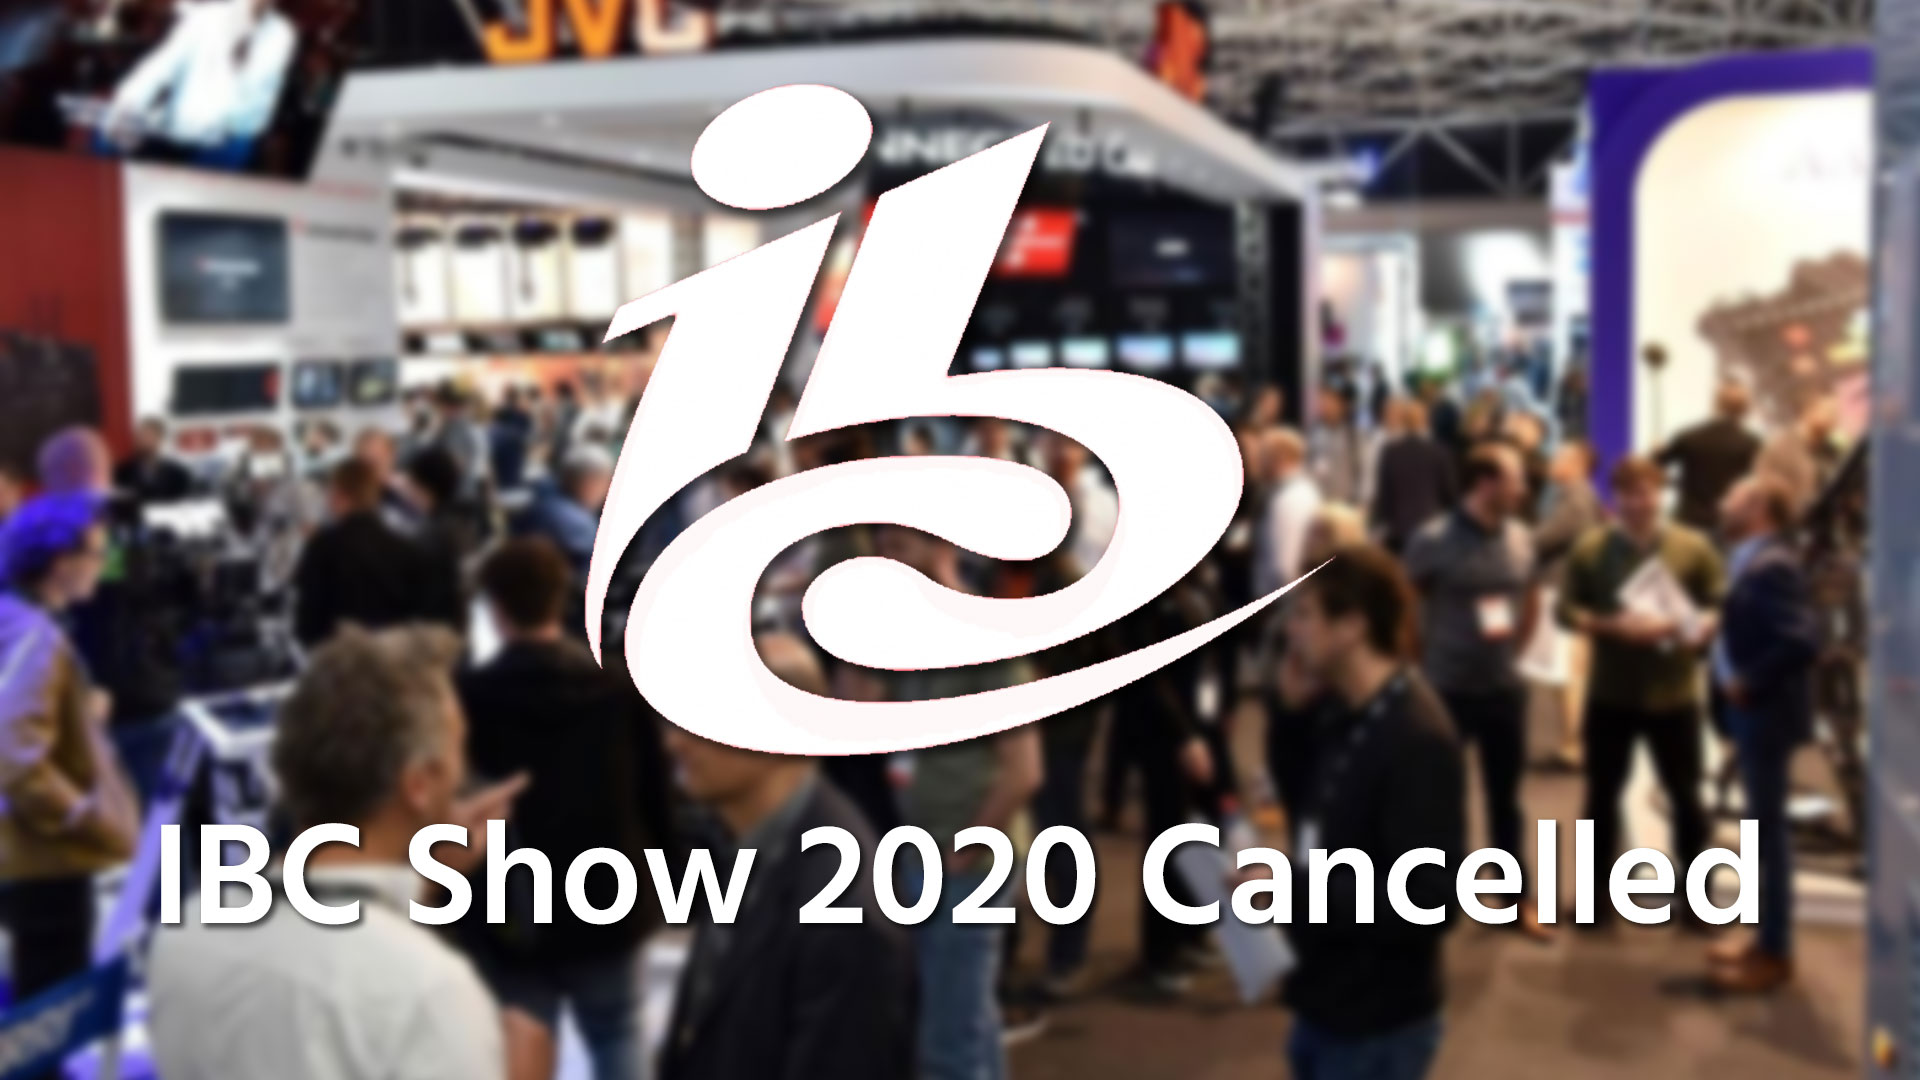 La Feria IBC 2020 ha sido cancelada debido al Coronavirus